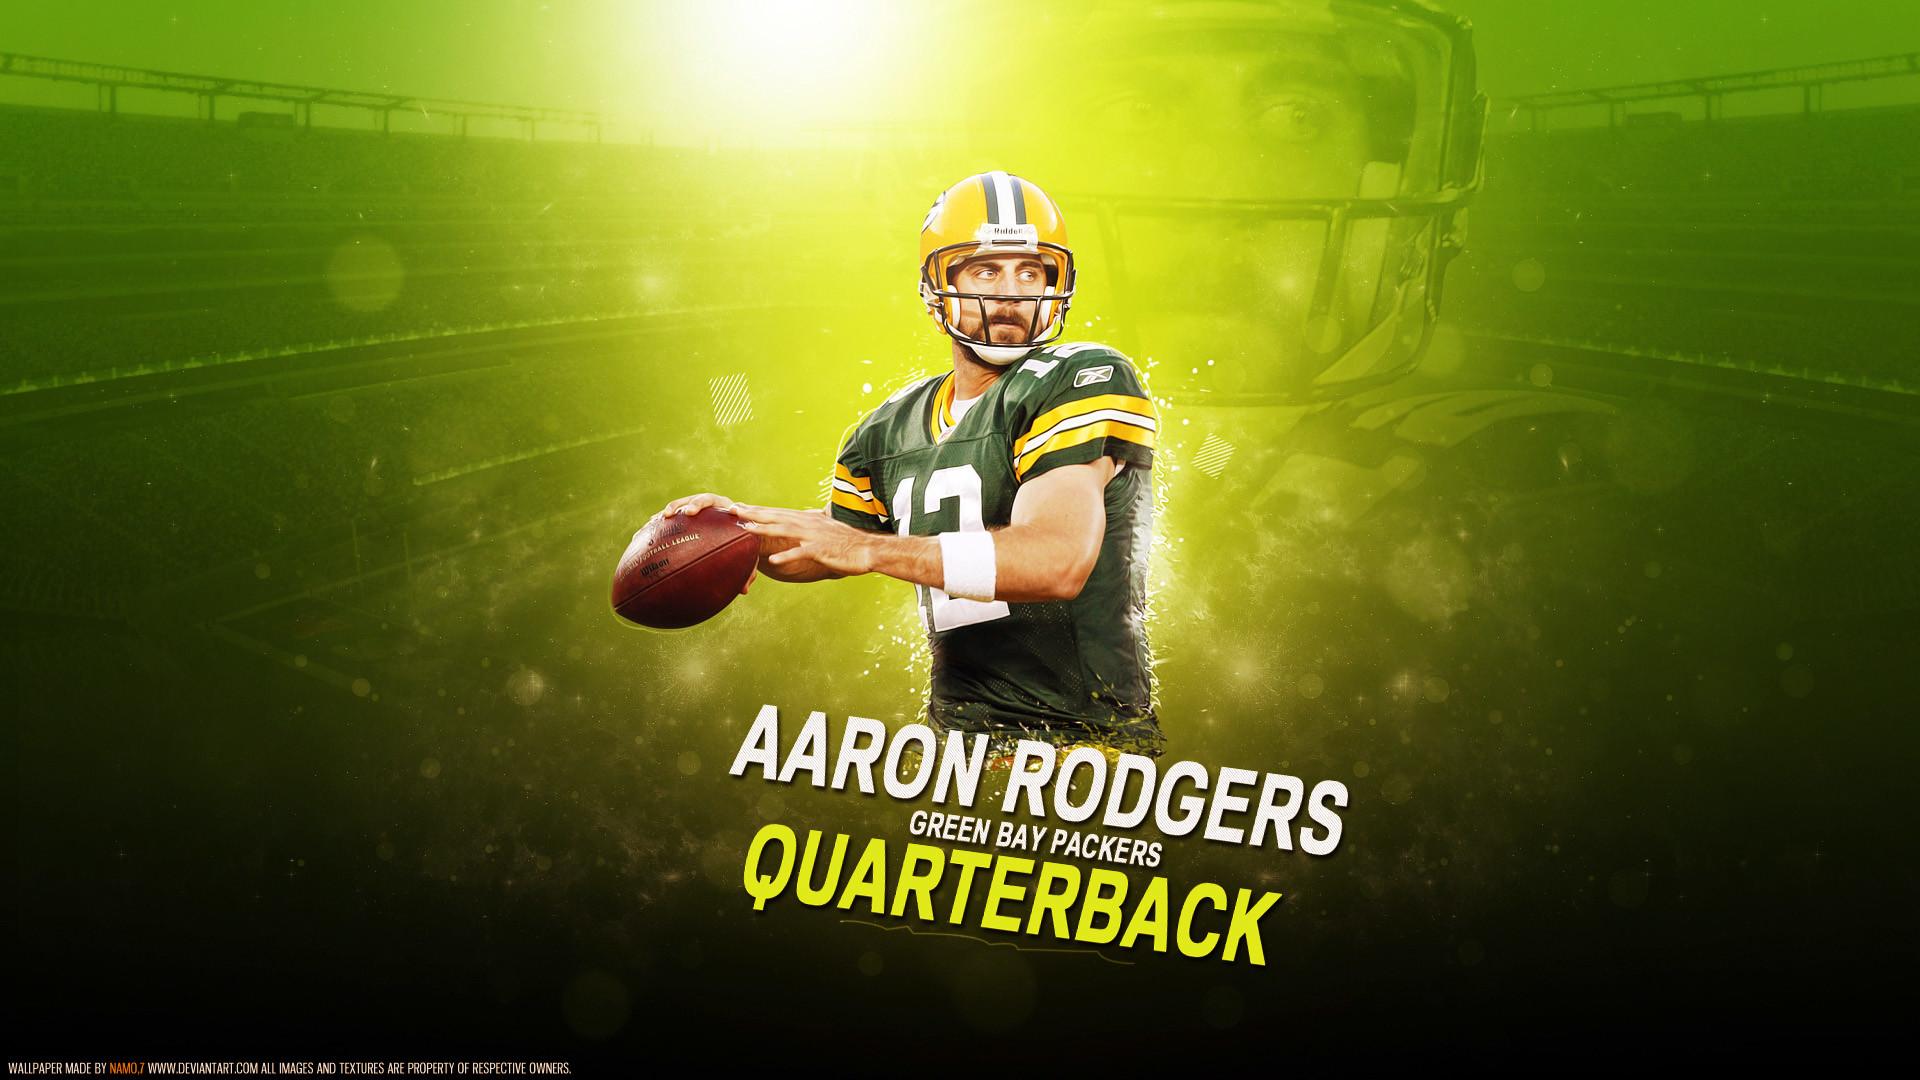 Aaron Rodgers Green Bay Packers wallpaper